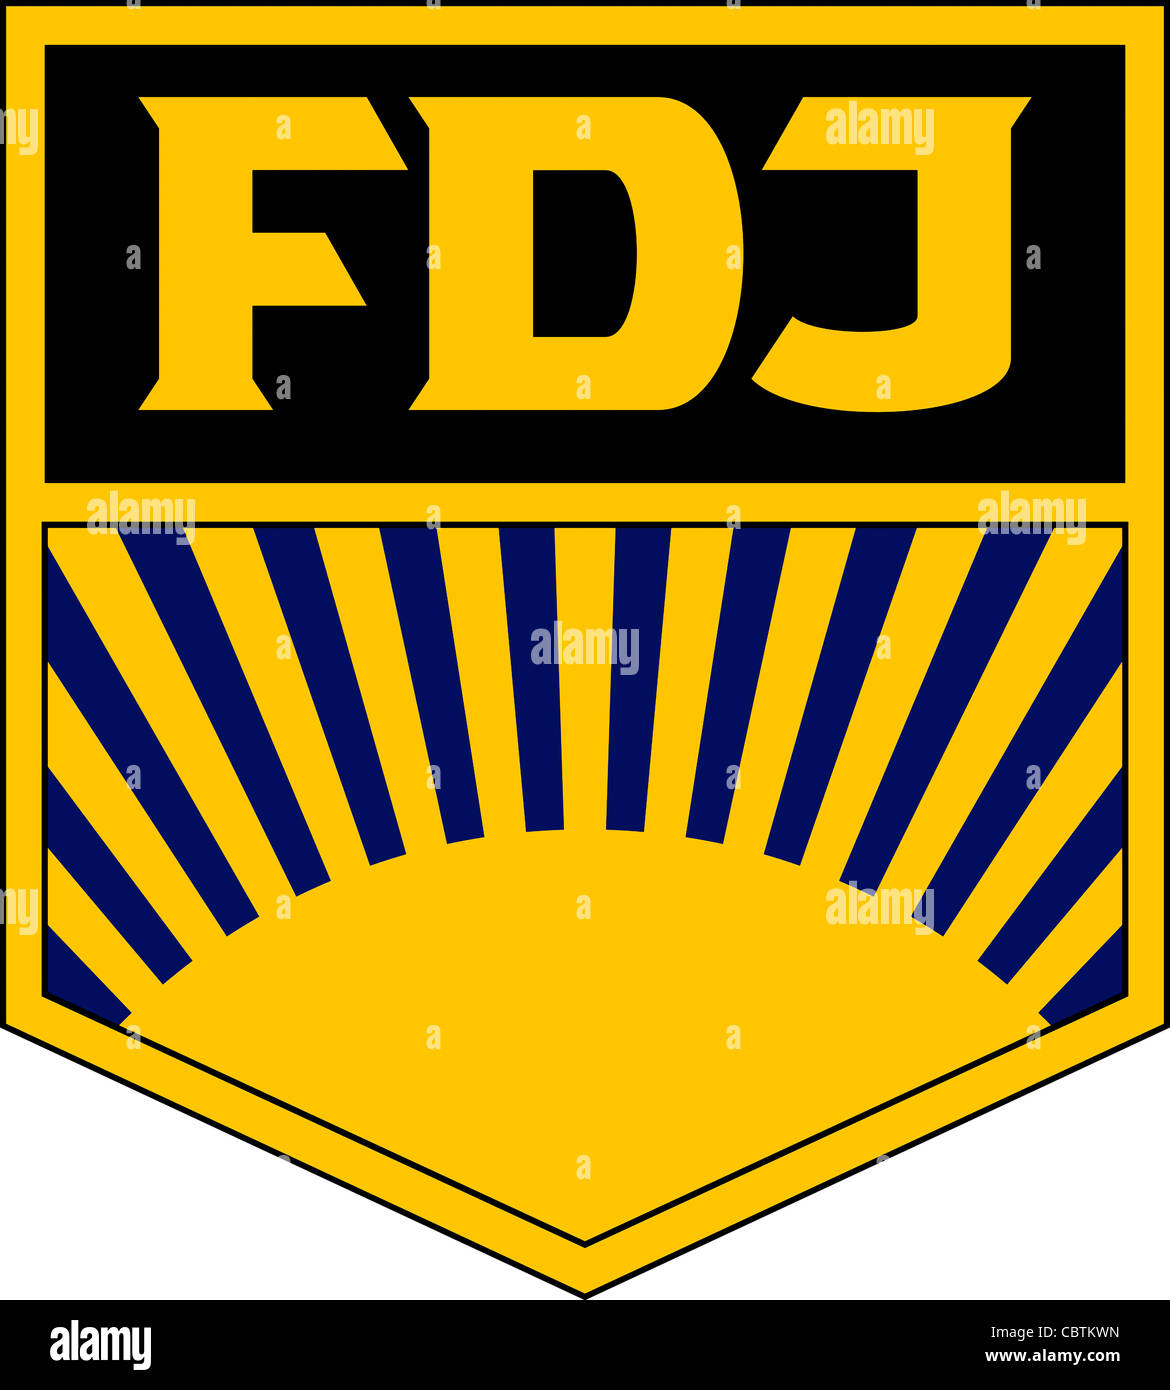 Logo of the GDR youth organization 'Freie Deutsche Jugend'  FDJ. - Stock Image